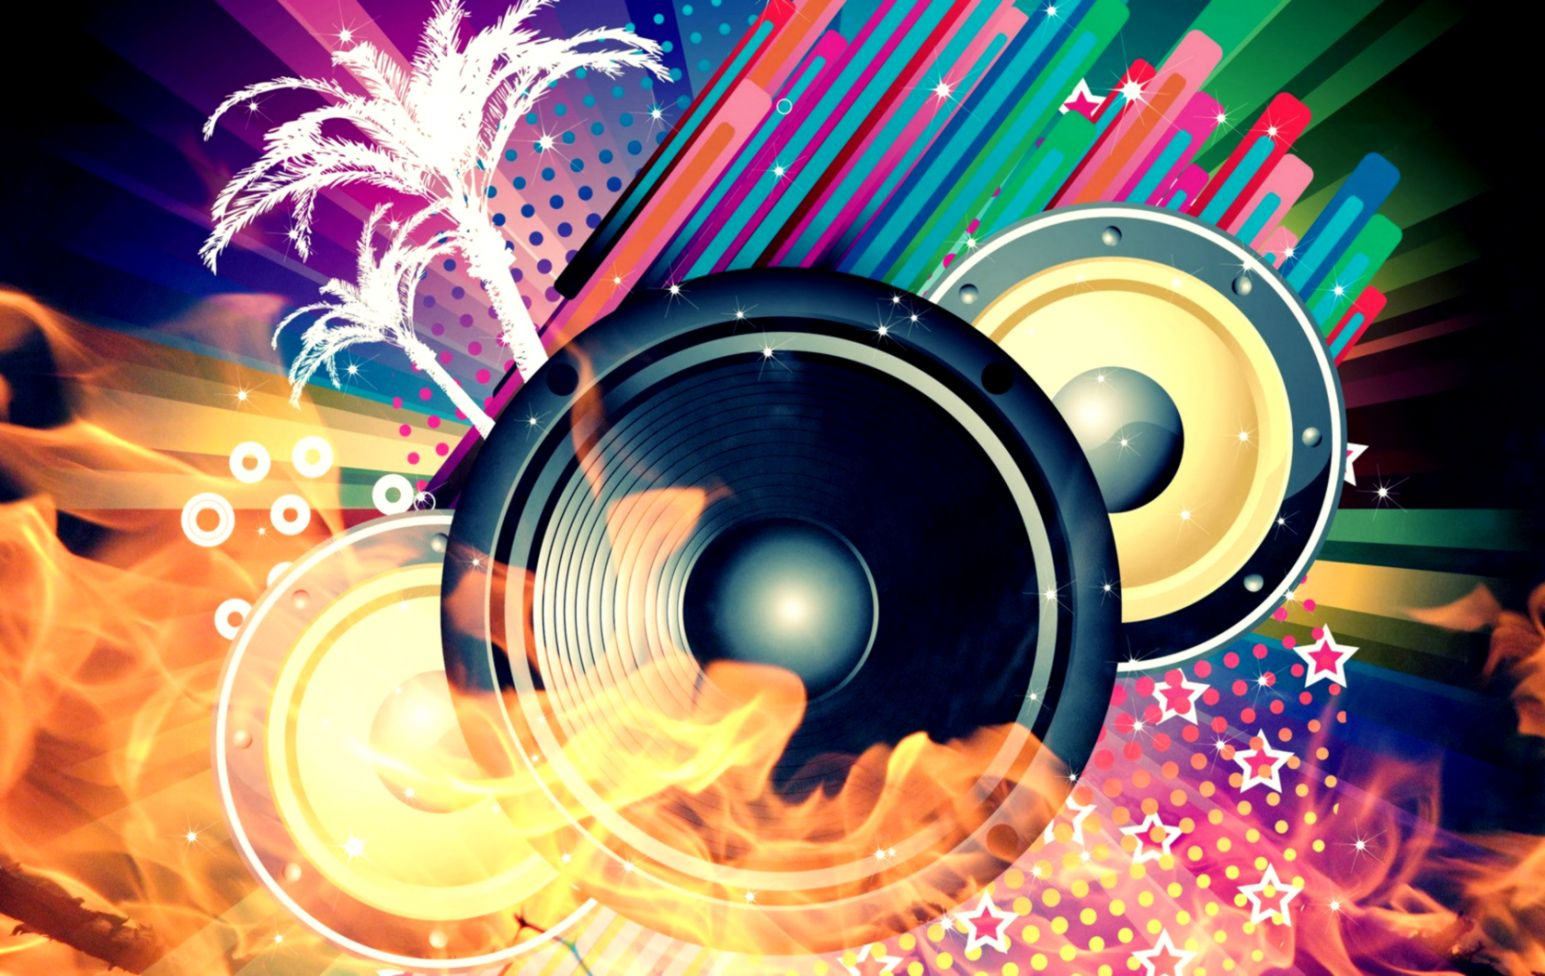 Cool Speaker Abstract Music Wallpaper Desktop HD